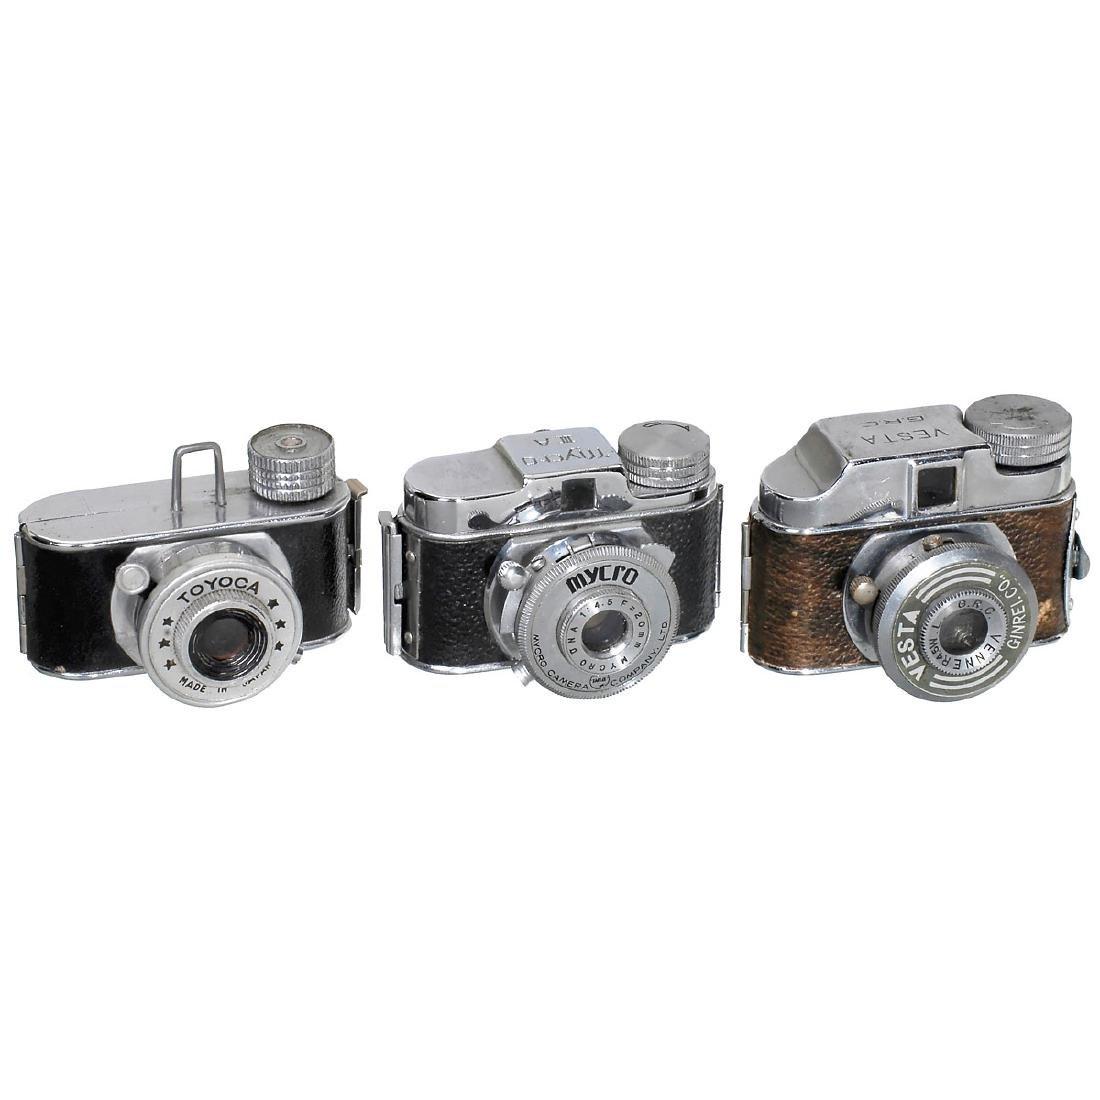 "3 Subminiature Cameras: ""Mycro IIIA"", Toyoka"" and"